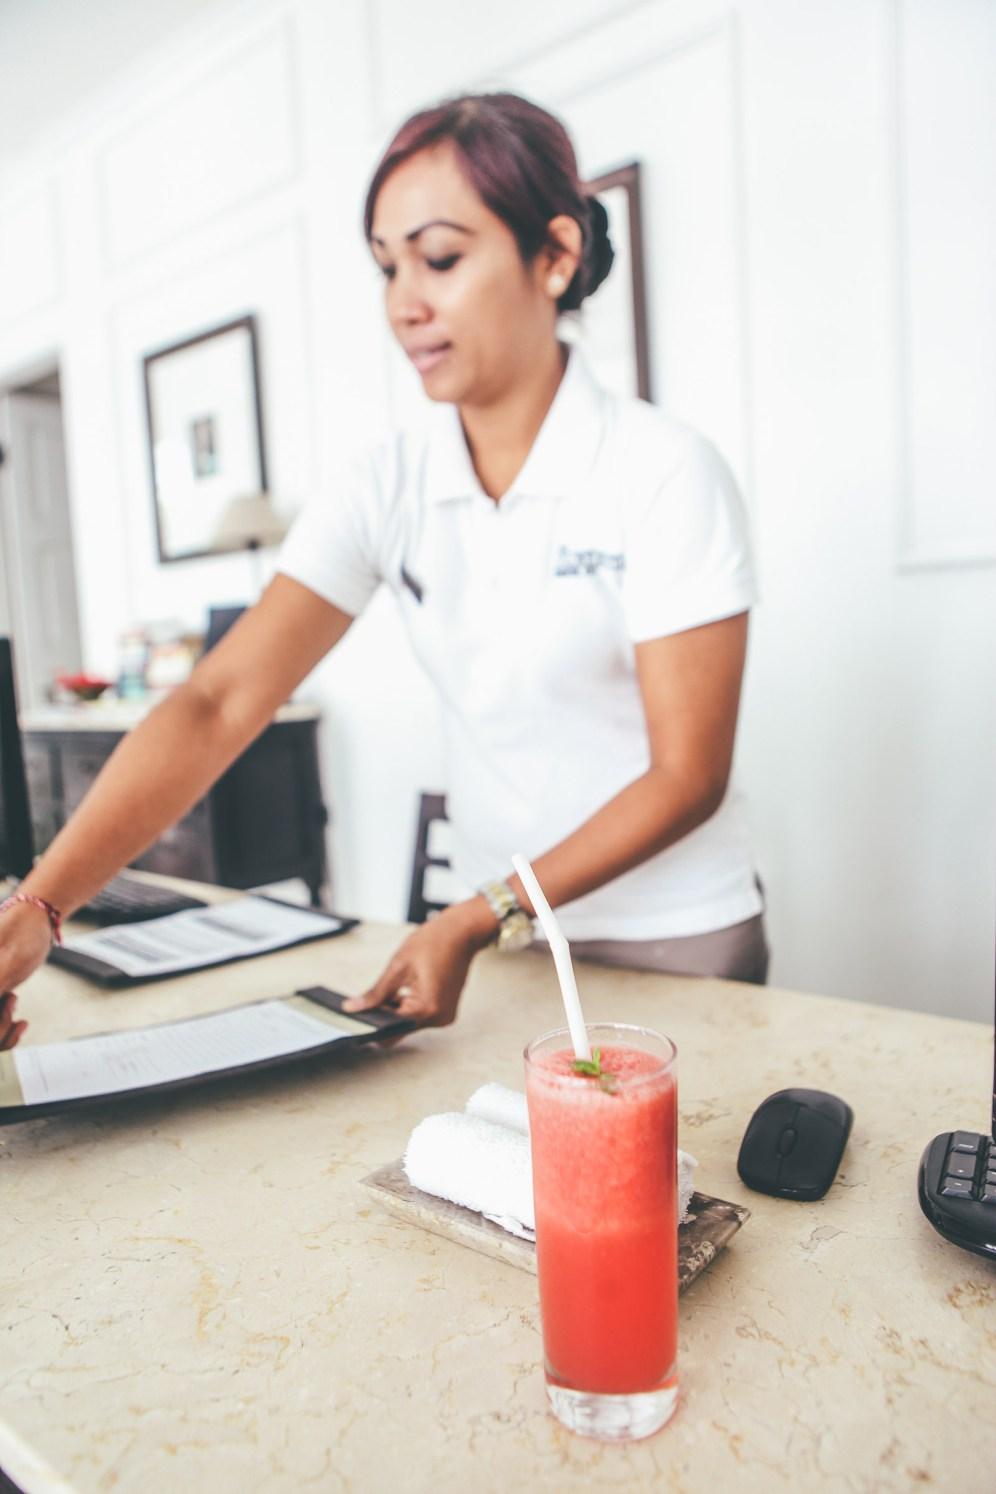 Sunshinestories-Travel-Blog-Bali-Guide-Seminyak-Eating-Staying-Hotel-Restaurant-Bar-Surfing-Uluwatu-Food-Coffe-Café-Kuta-IMG_2024